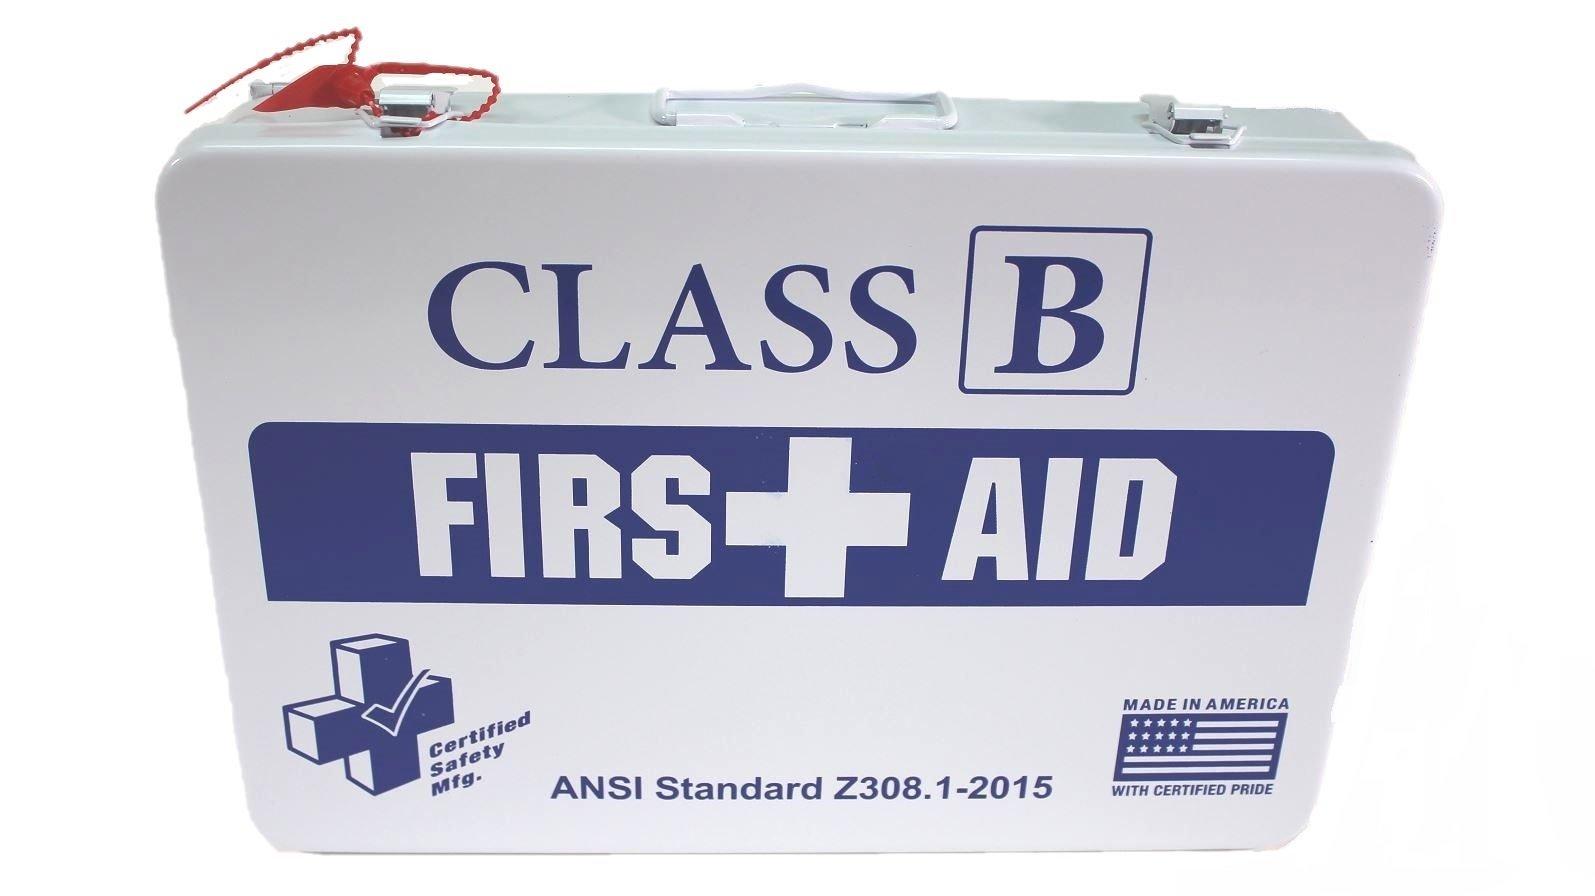 Certified Safety K615-019 36M Class B First Aid Kit, ANSI Z308.1-2015, Metal Case